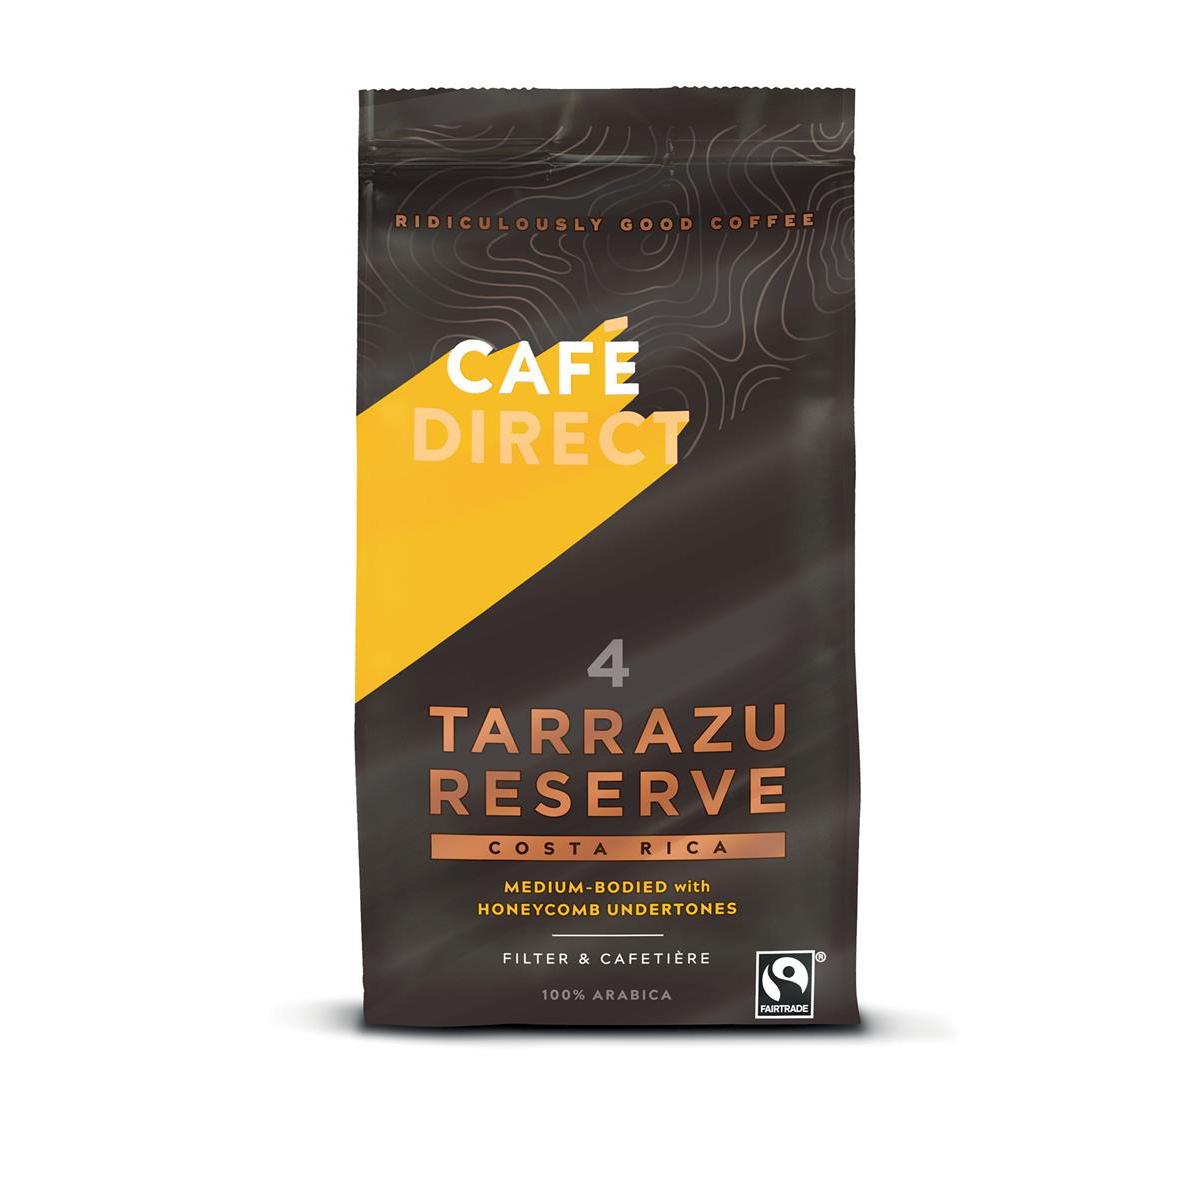 Cafe Direct Tarrazu Costa Rica Fairtrade Roast and Ground Coffee 227g Ref FCR0024